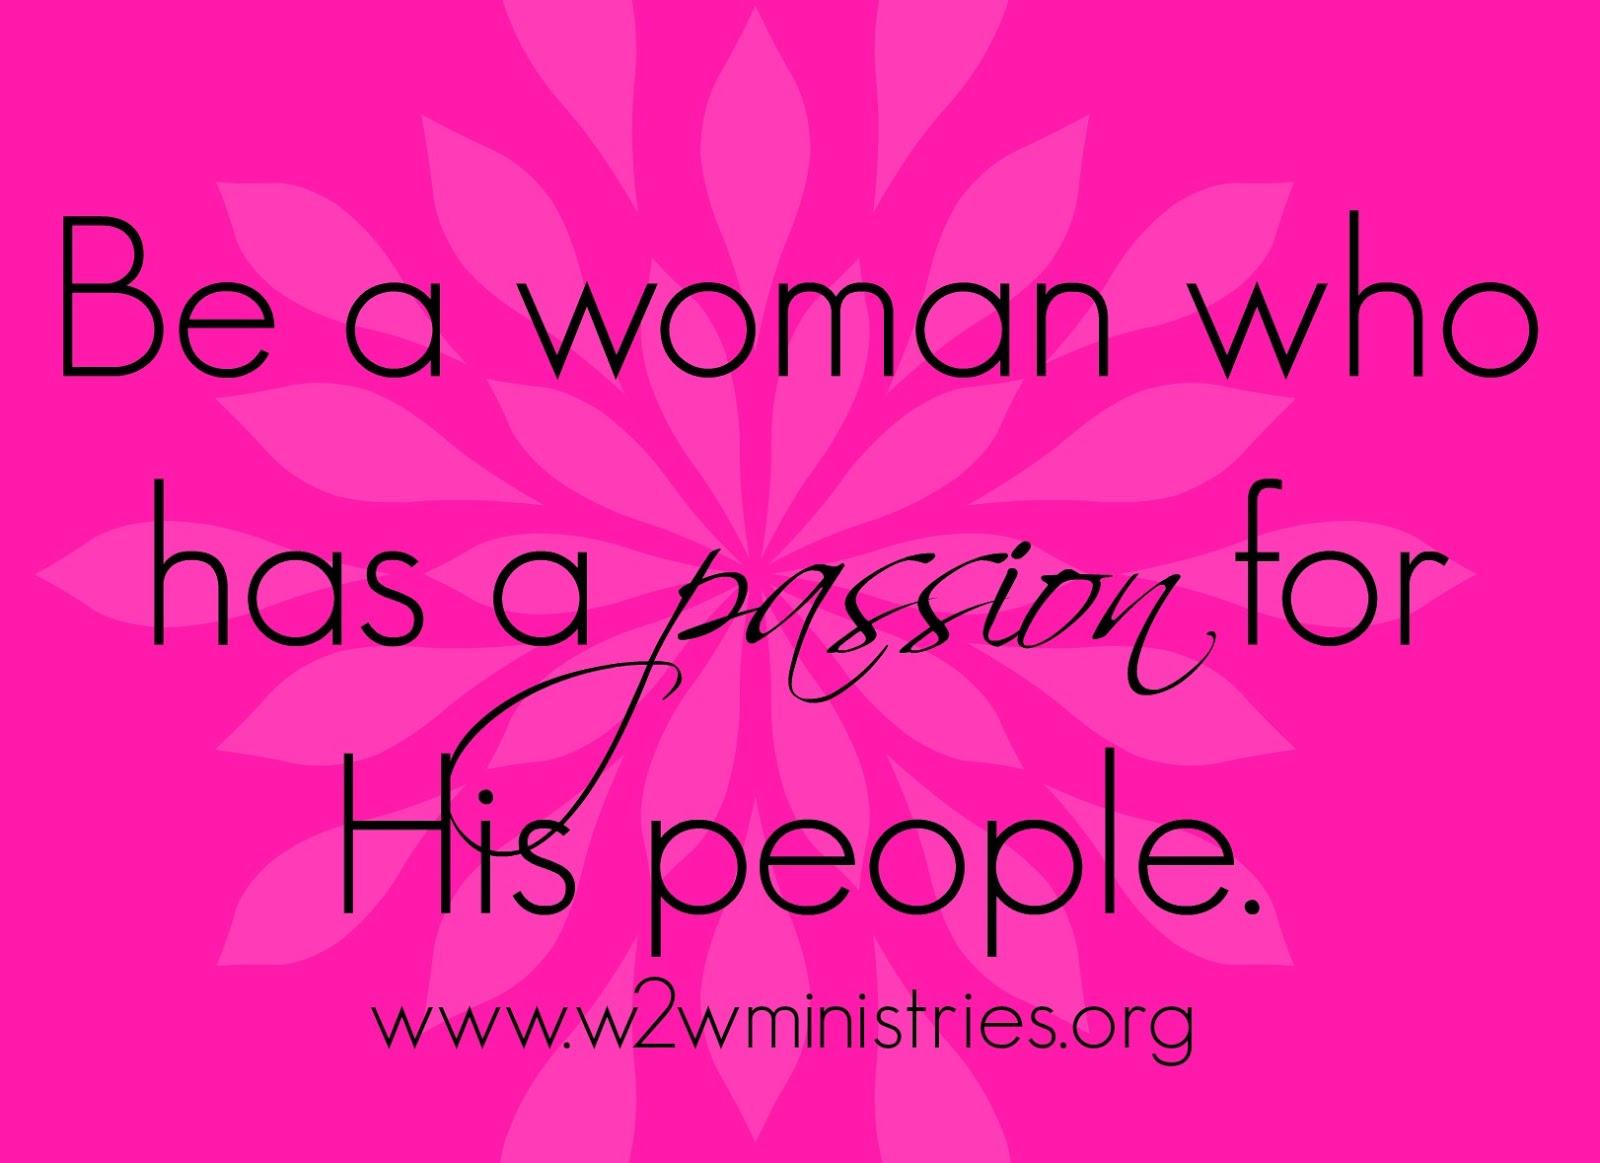 i need passion